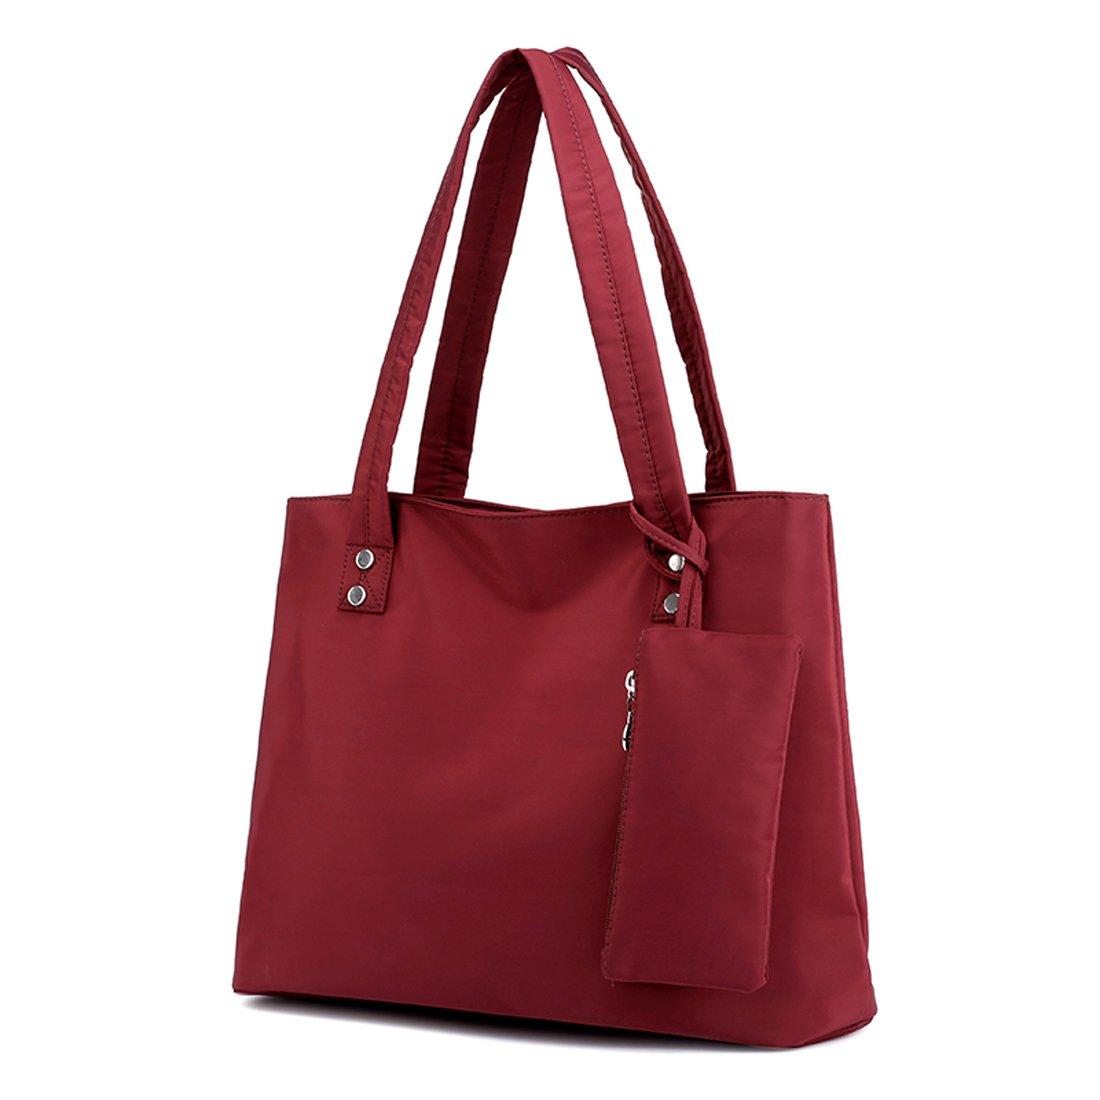 Alovhad Women Handbag Shoulder Bags Purse Waterproof Nylon Tote Travel hobo Bags Purse BGWH-A3US001